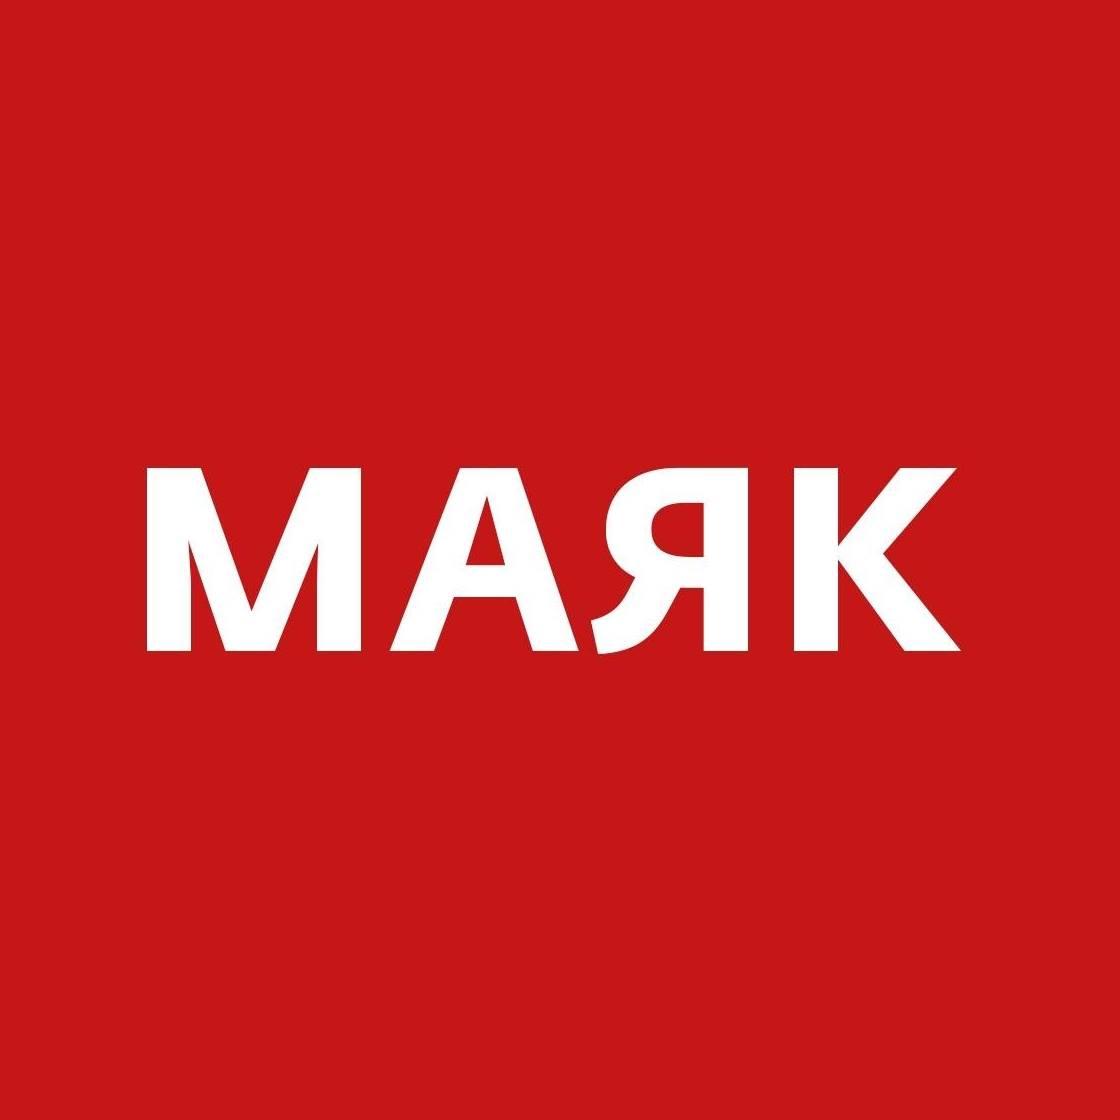 Радио Маяк 68.48 УКВ Россия, Сыктывкар